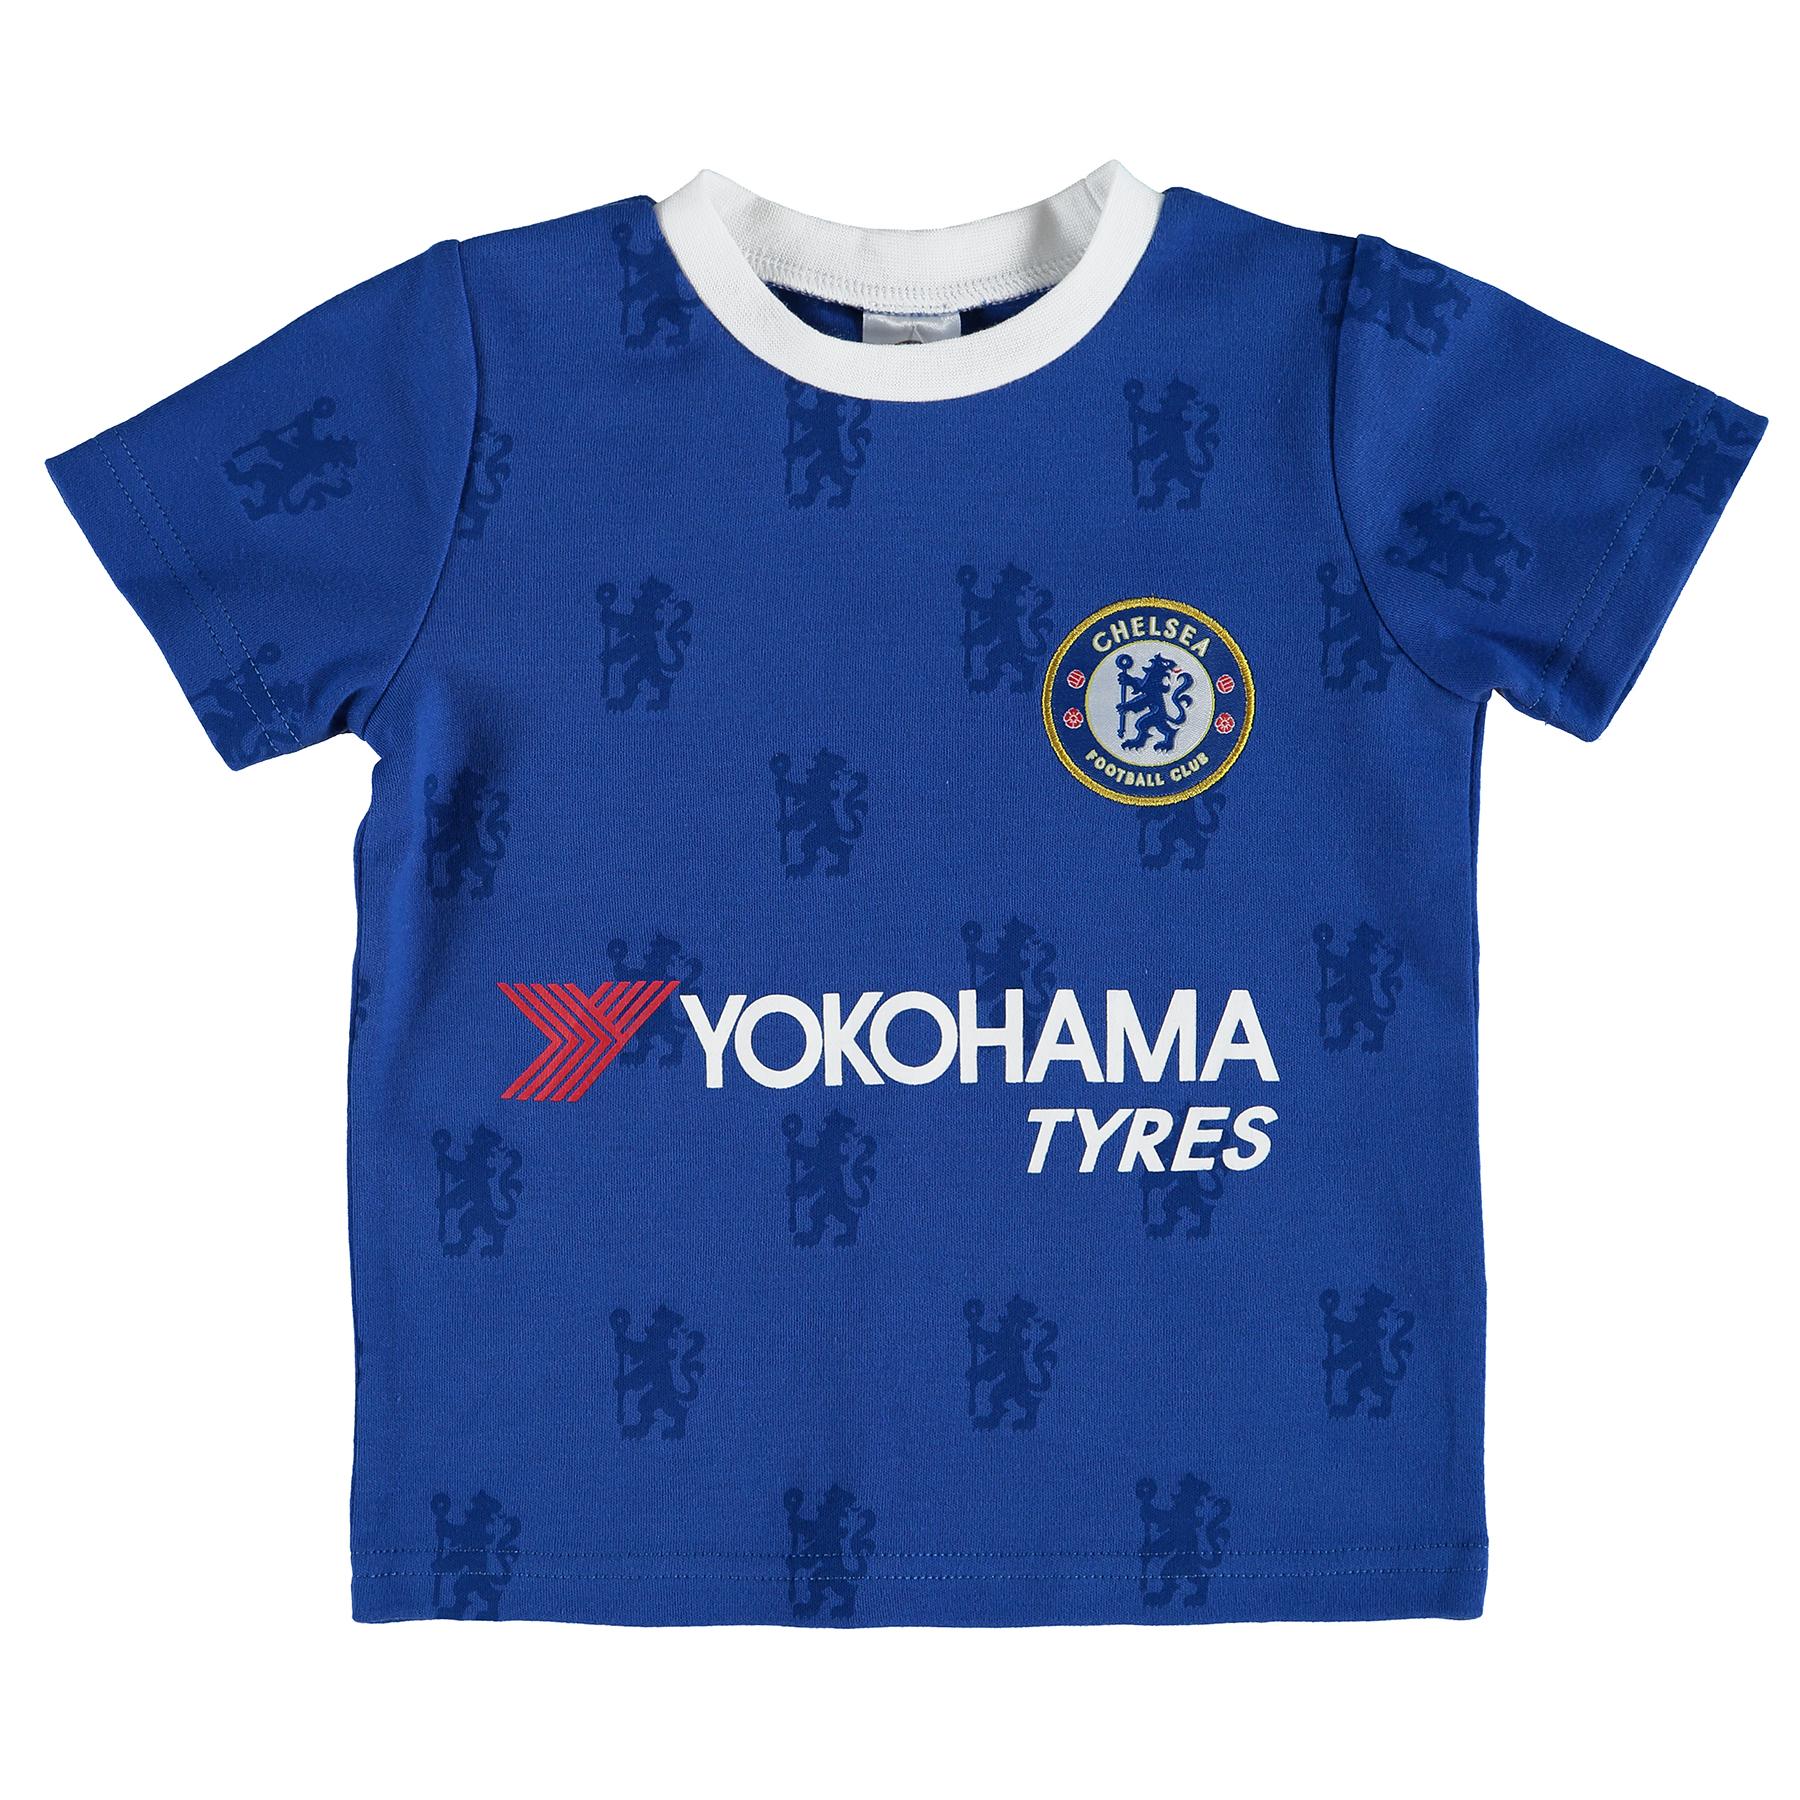 Chelsea Kit T-Shirt - Royal - Baby